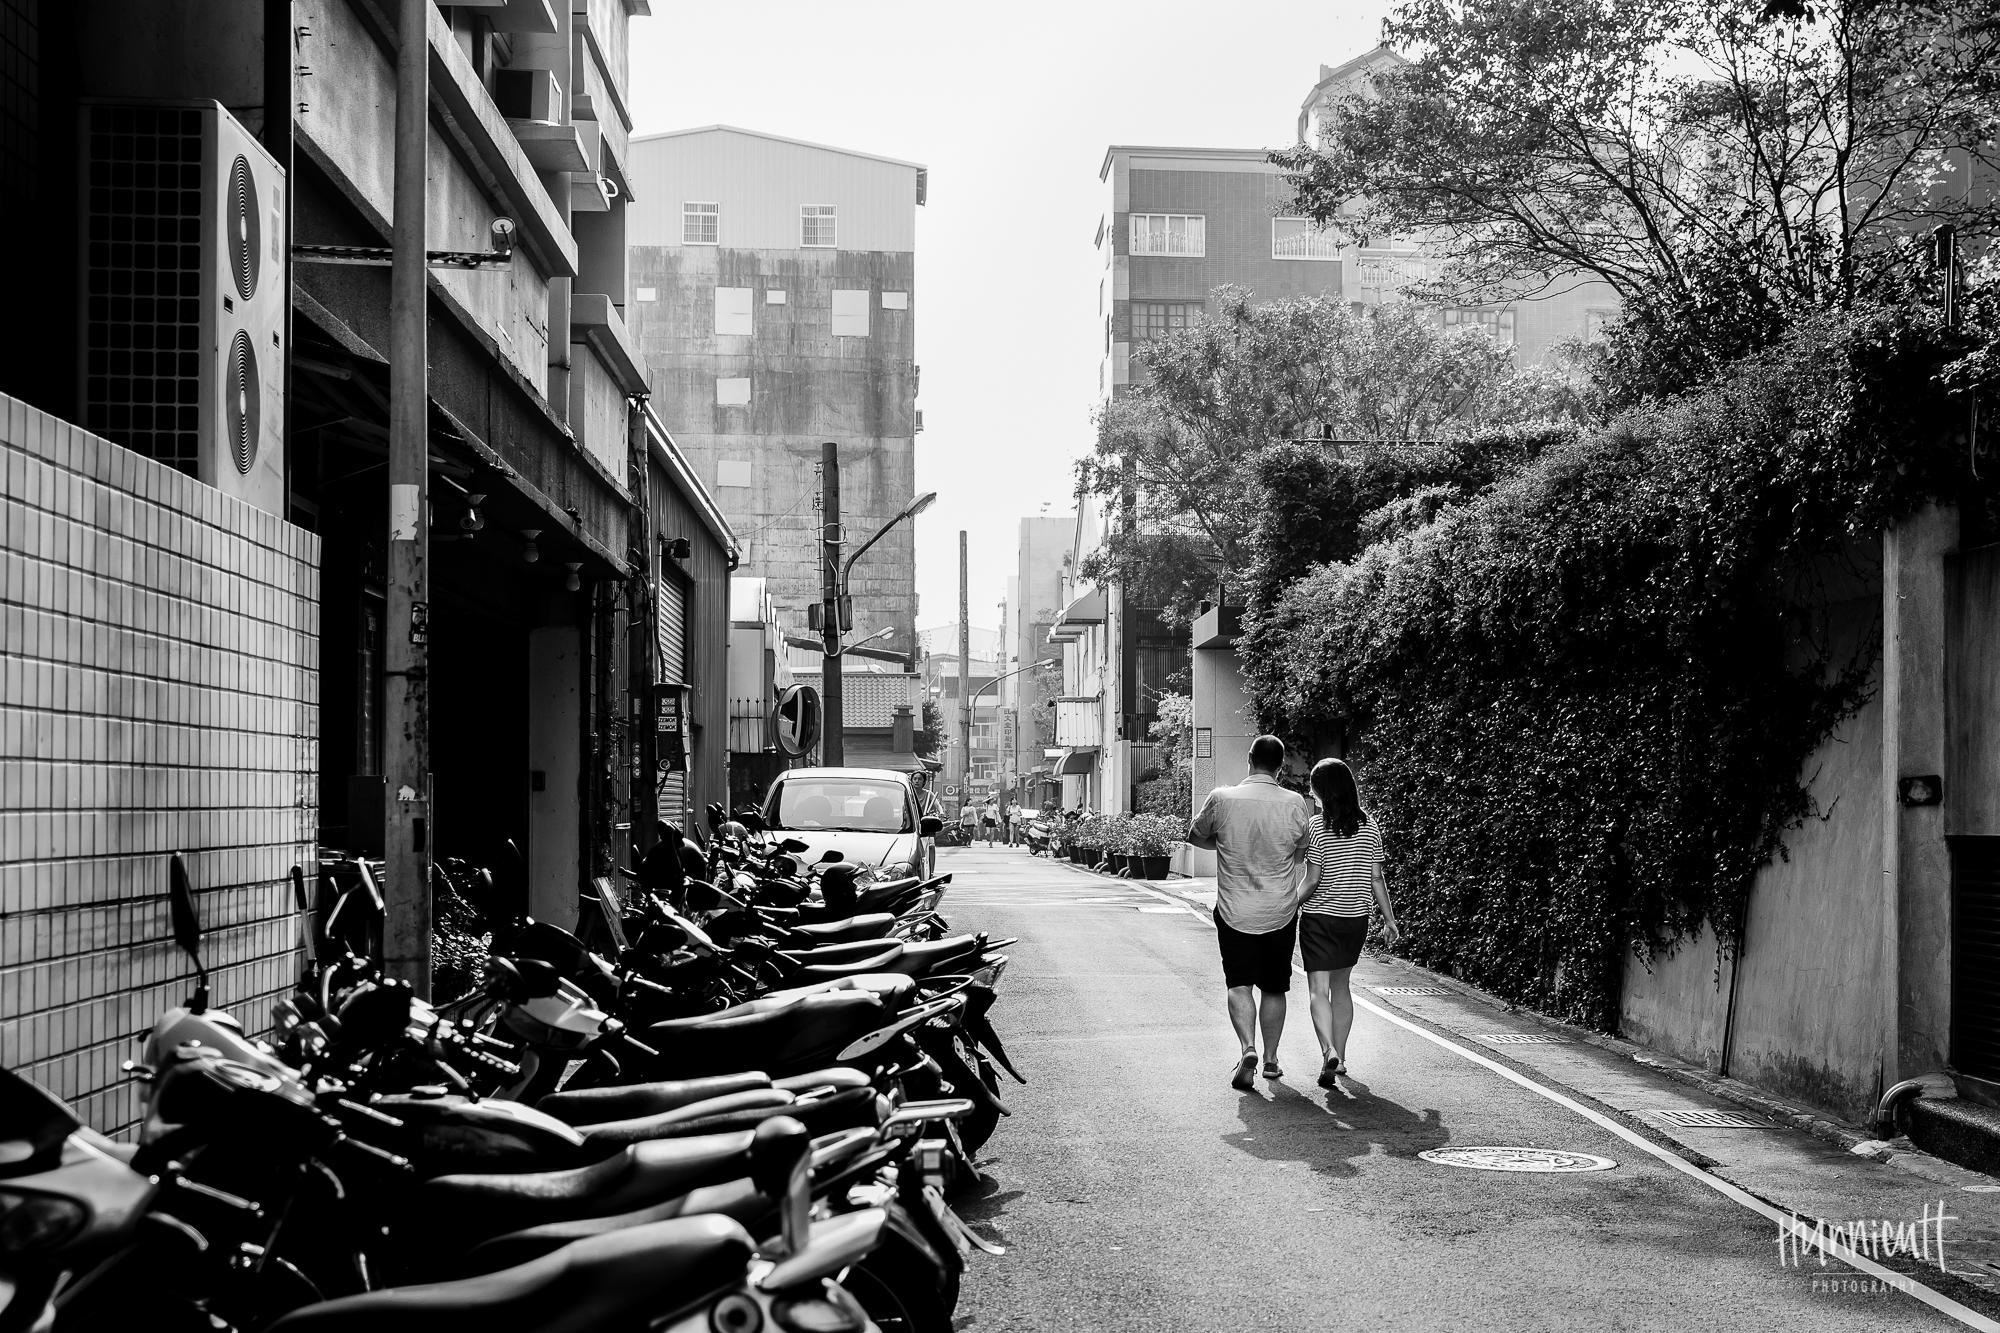 Hunnicutt_Photography_Taichung_Urban_Lifestyle_Family_Photography_indoor_outdoor_rebecca_hunnicutt_farren_adoption-20